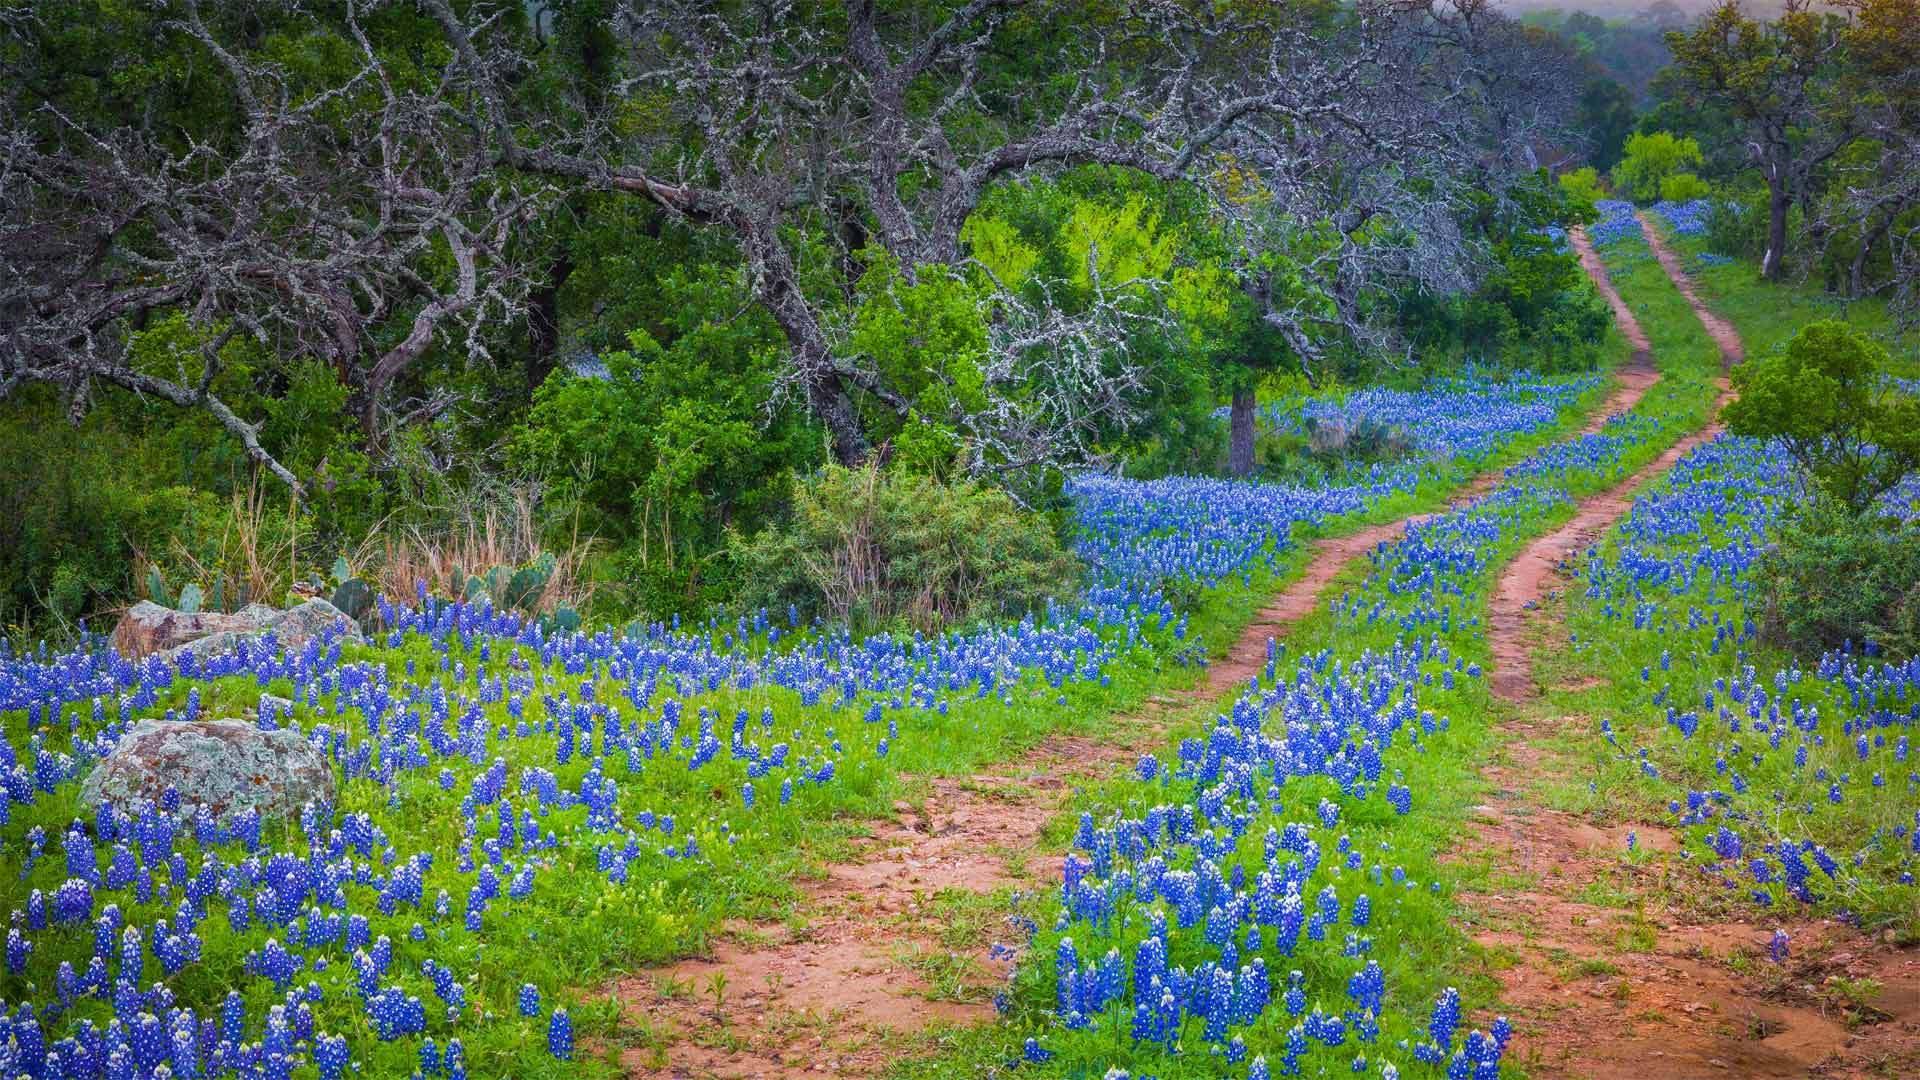 印克斯湖国家公园中的德克萨斯矢车菊矢车菊